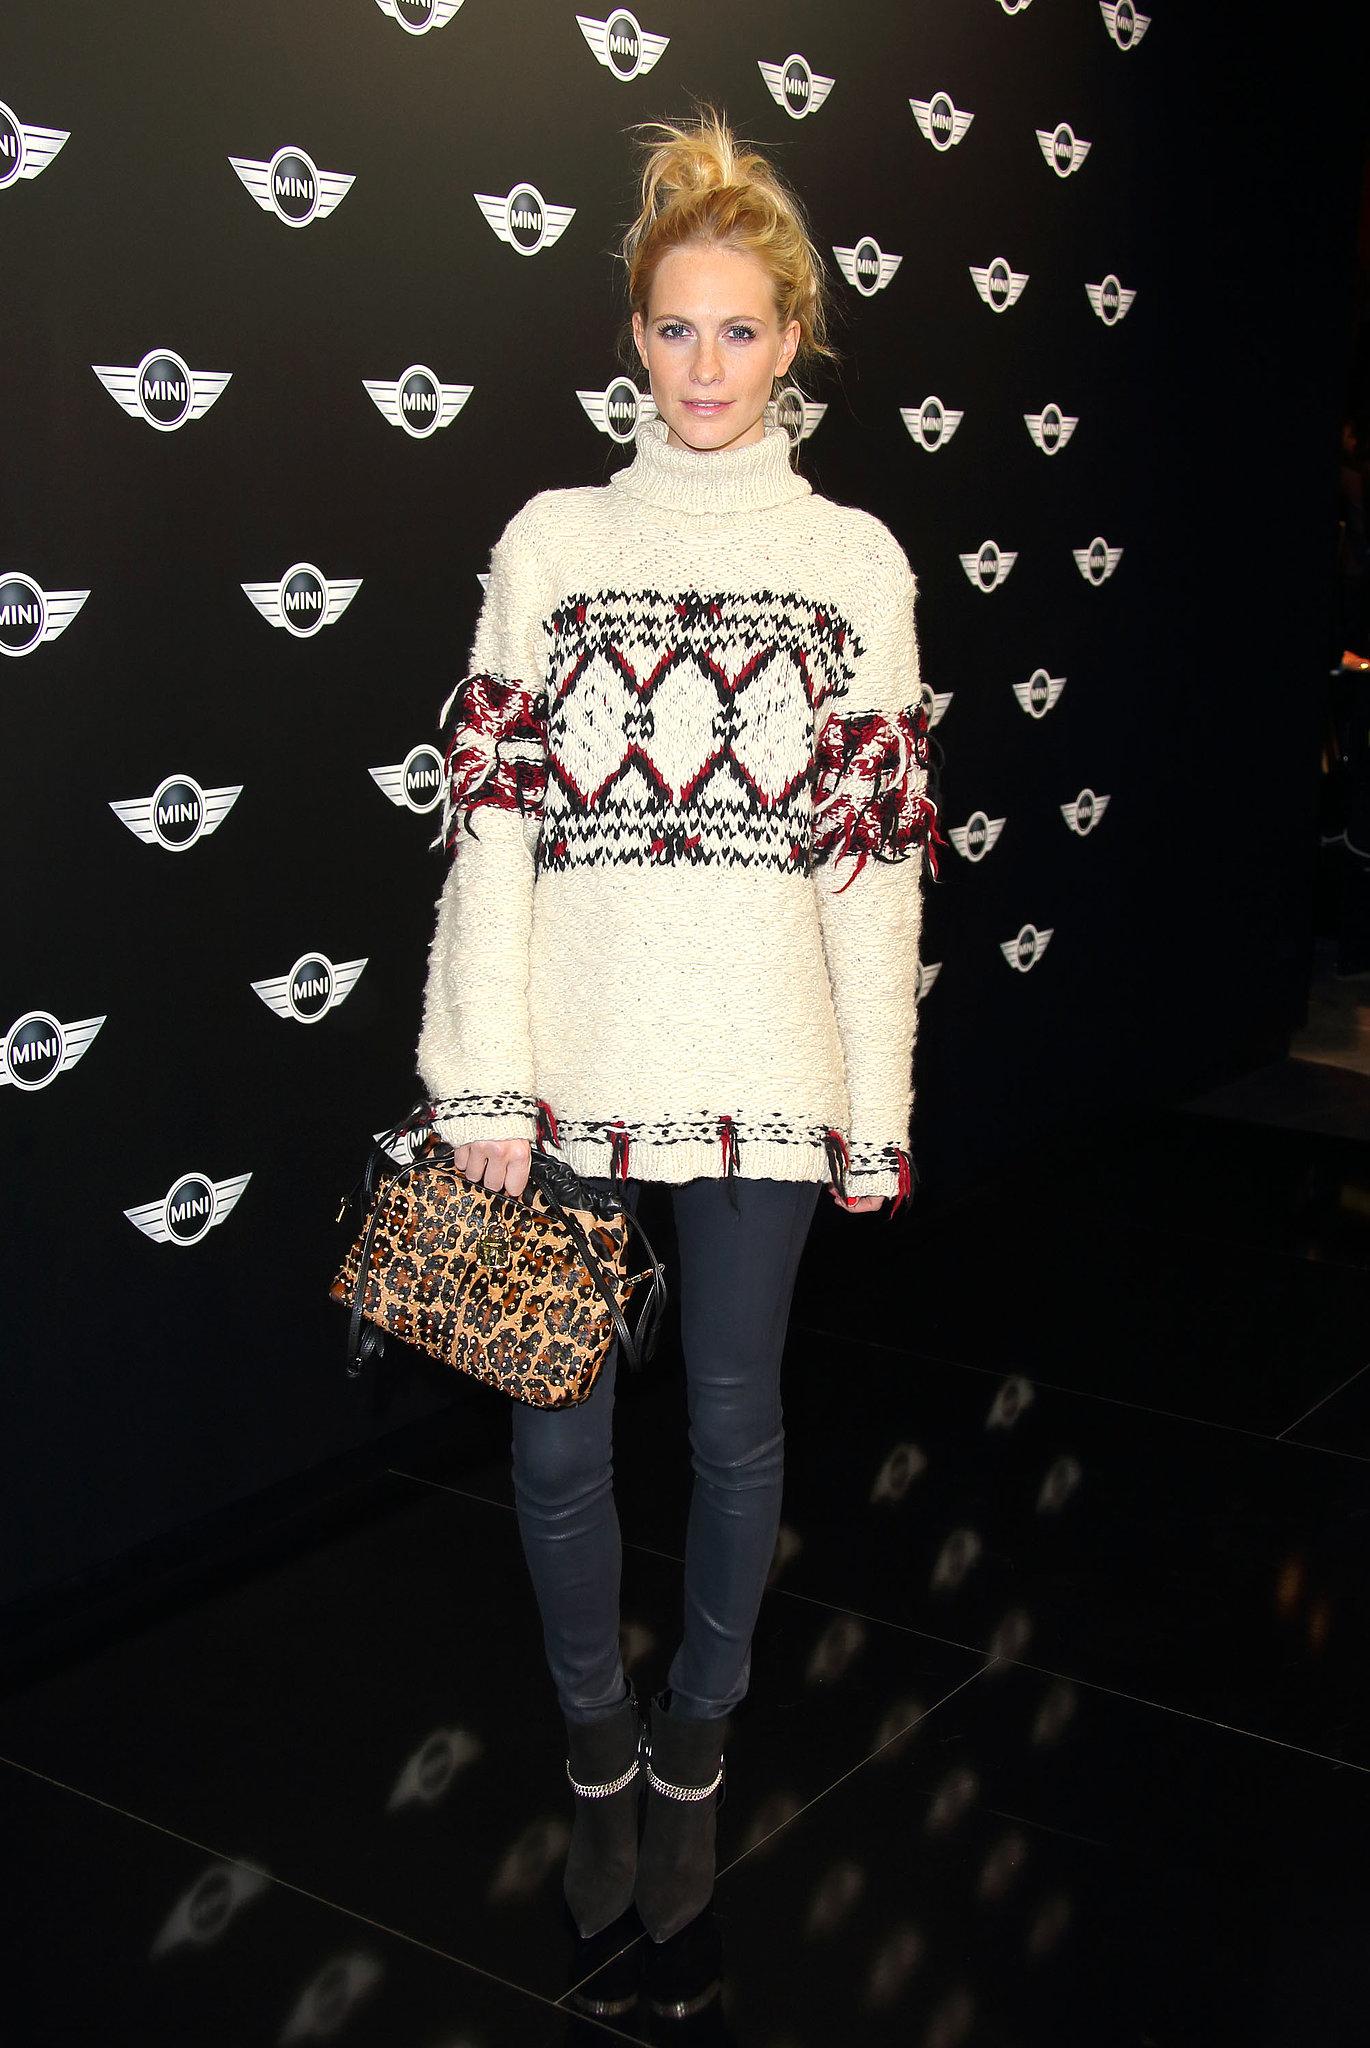 Poppy Delevingne at the world premiere of the new Mini.